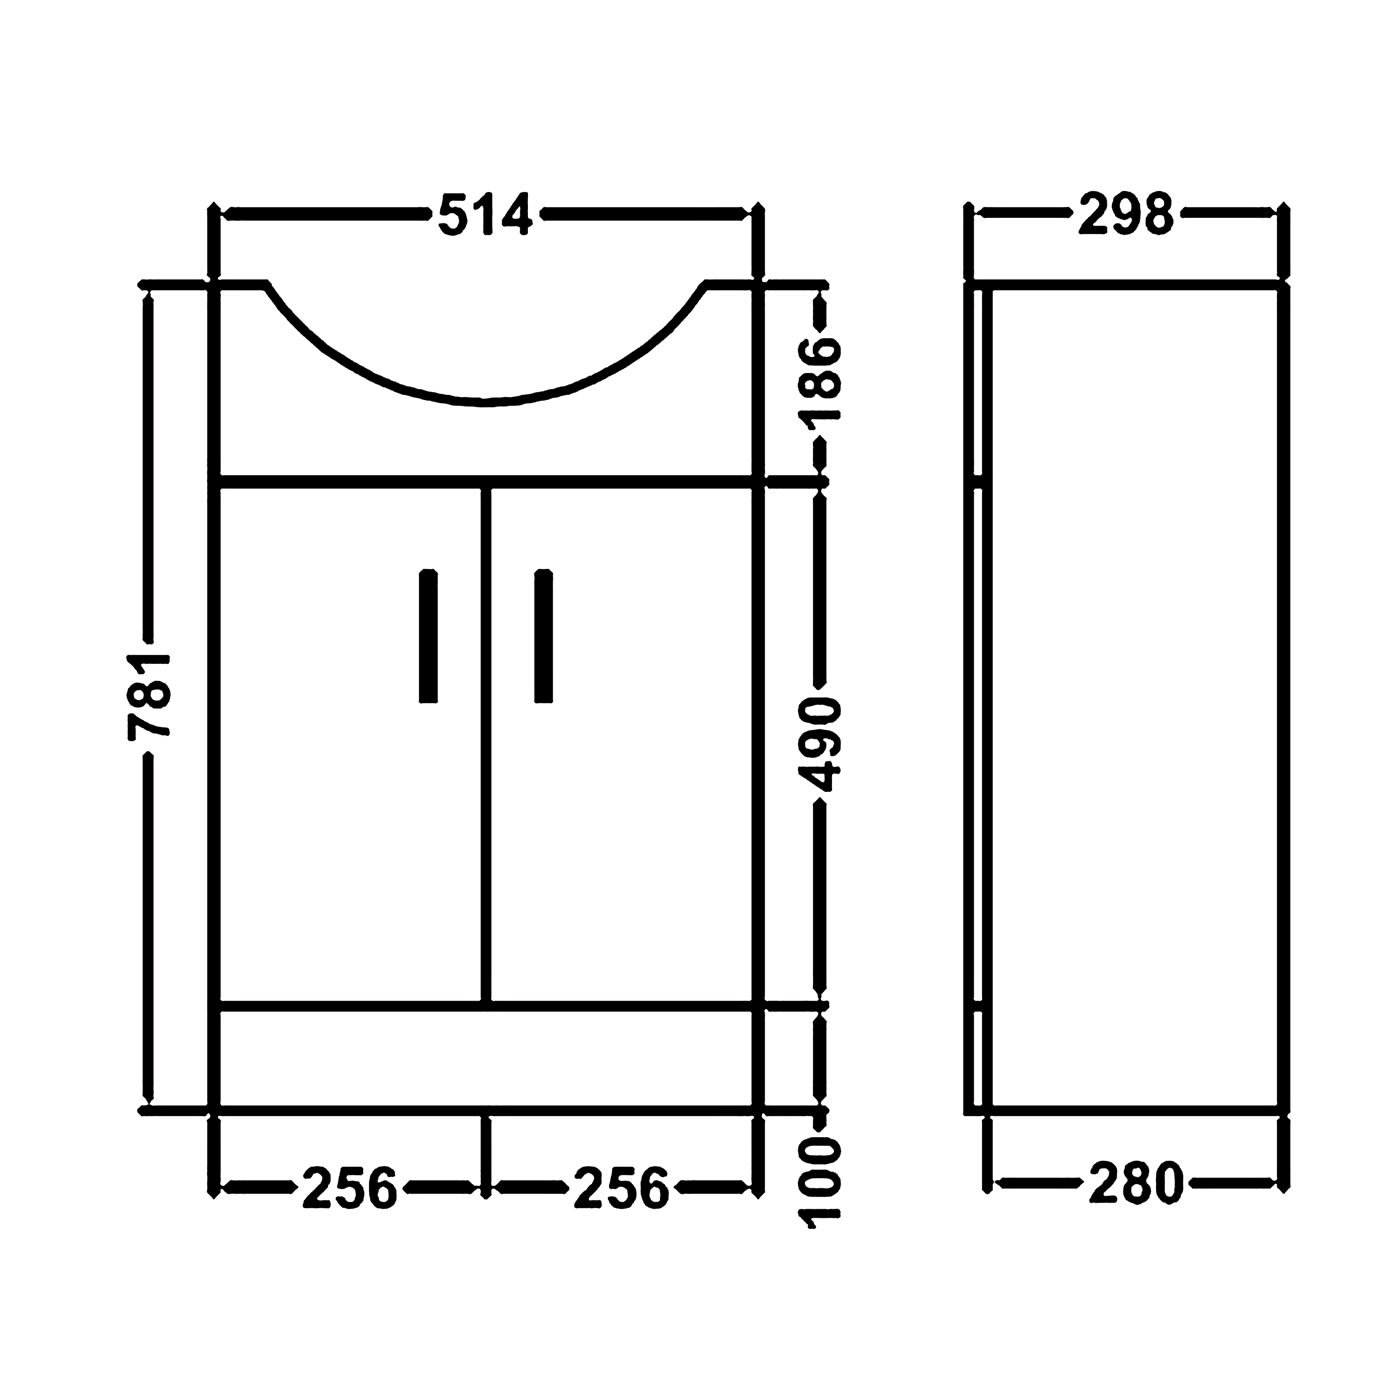 gloss gloss modular bathroom furniture collection vanity. unique furniture veebath linx bathroom white gloss vanity unit basin sink 550mm storage  cabinet ceramic furniture amazoncouk kitchen u0026 home on modular furniture collection